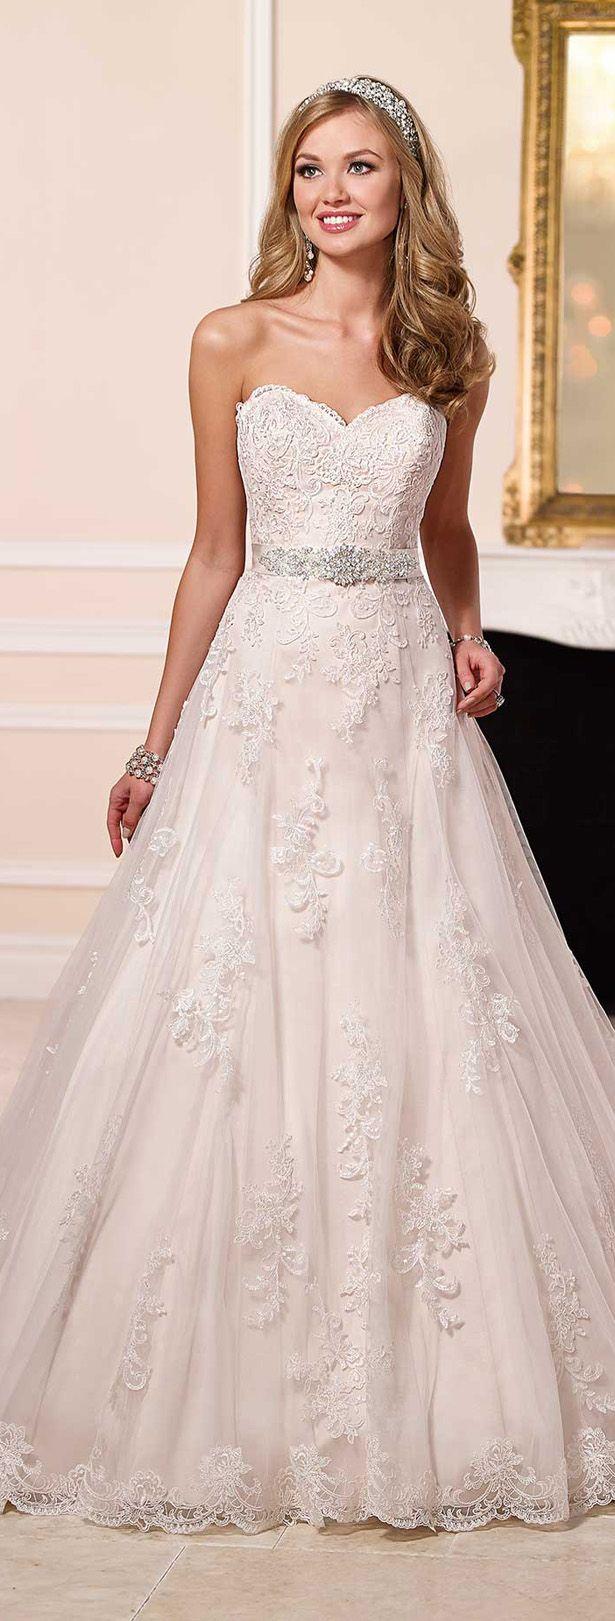 Stella York Spring 2016 Wedding Dress www.finditforweddings.com  Lace wedding dress